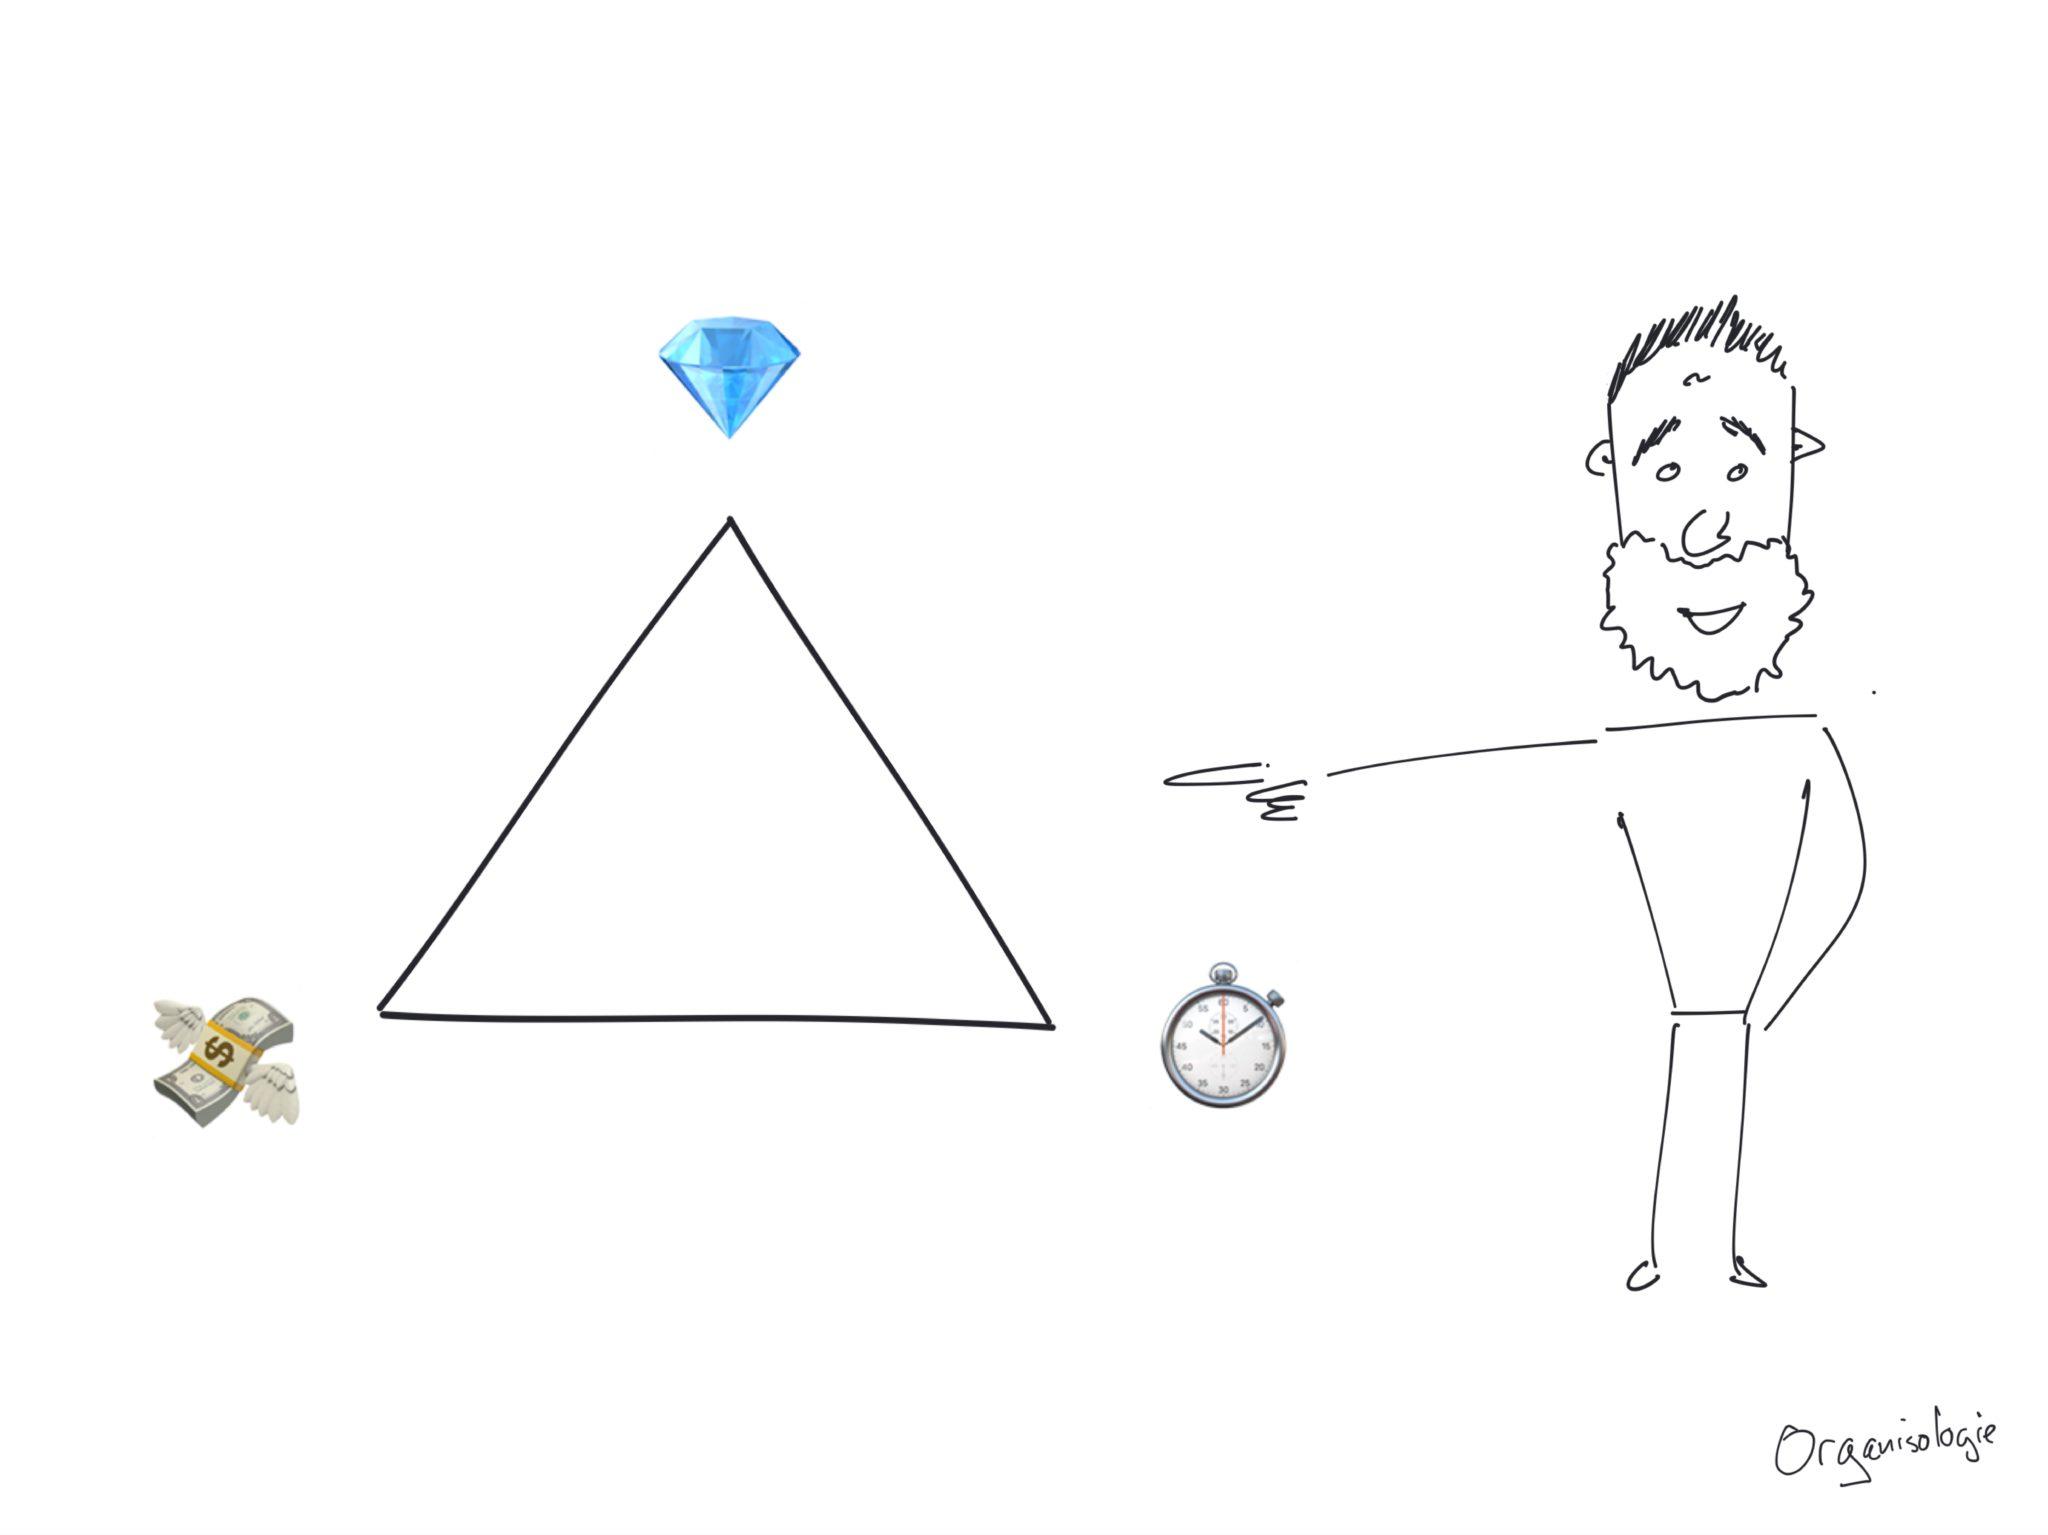 triangle QCD qualité coûts délais